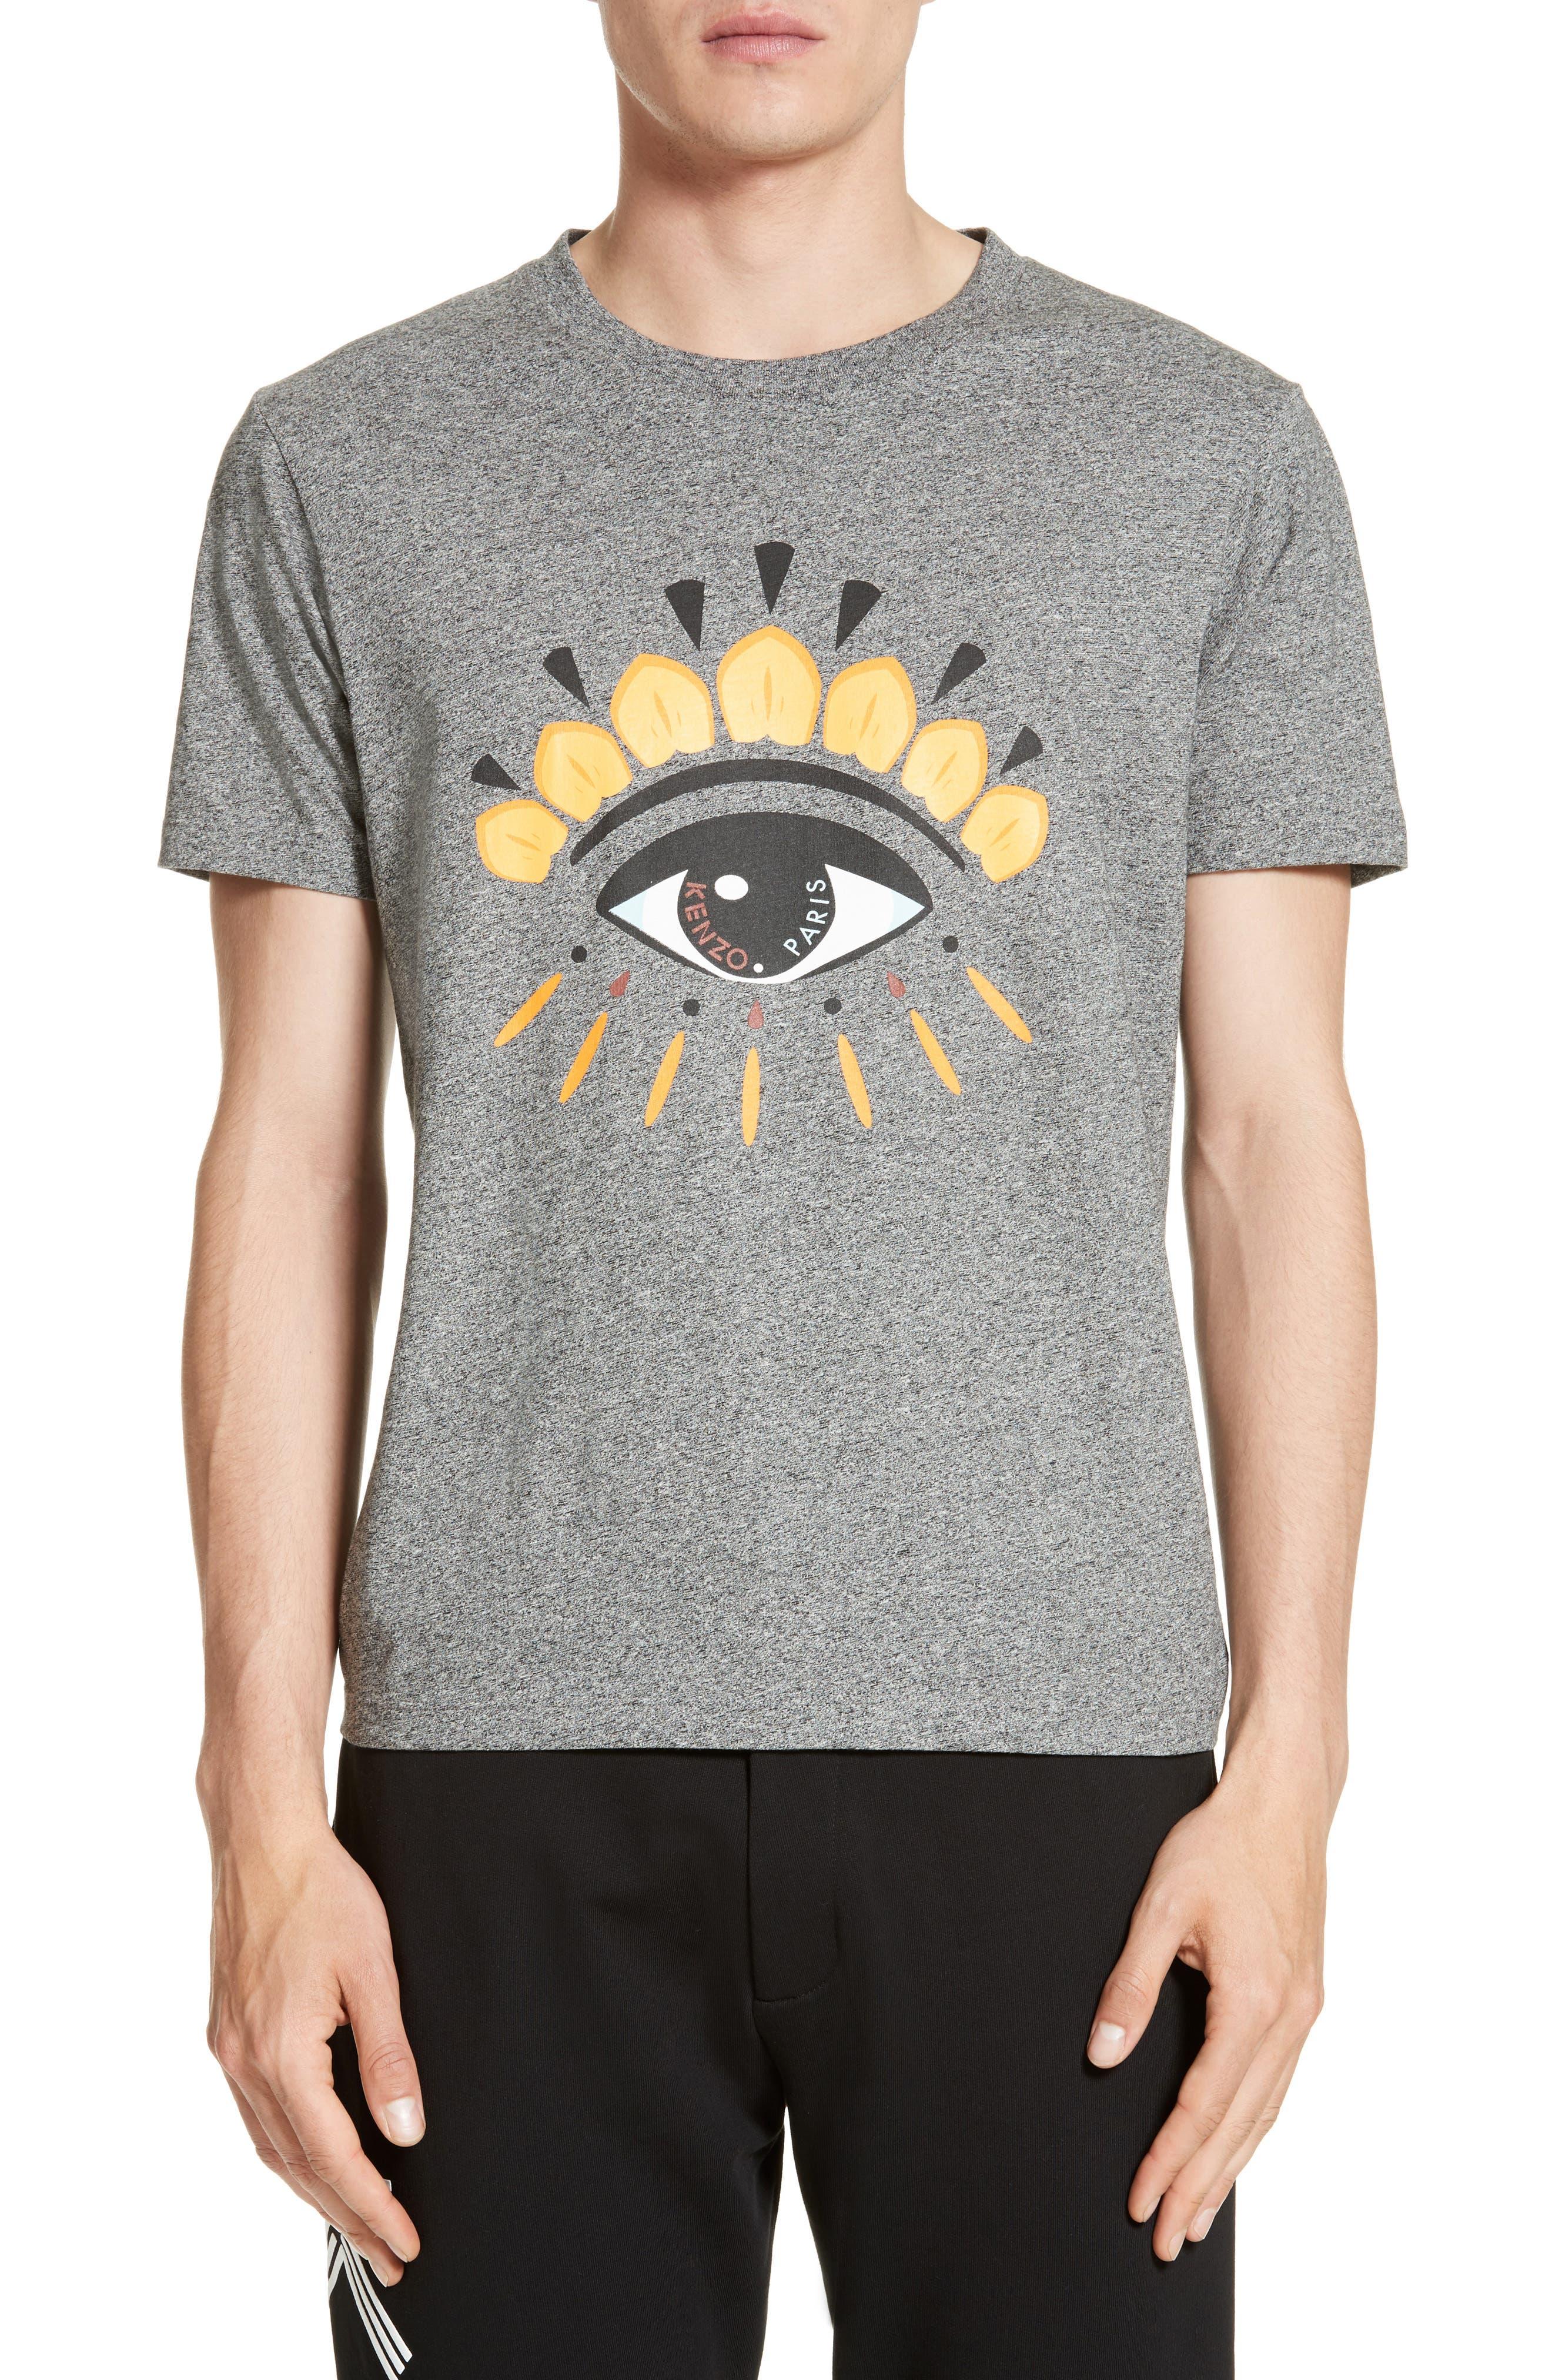 Main Image - Kenzo Embroidered Eye T-Shirt